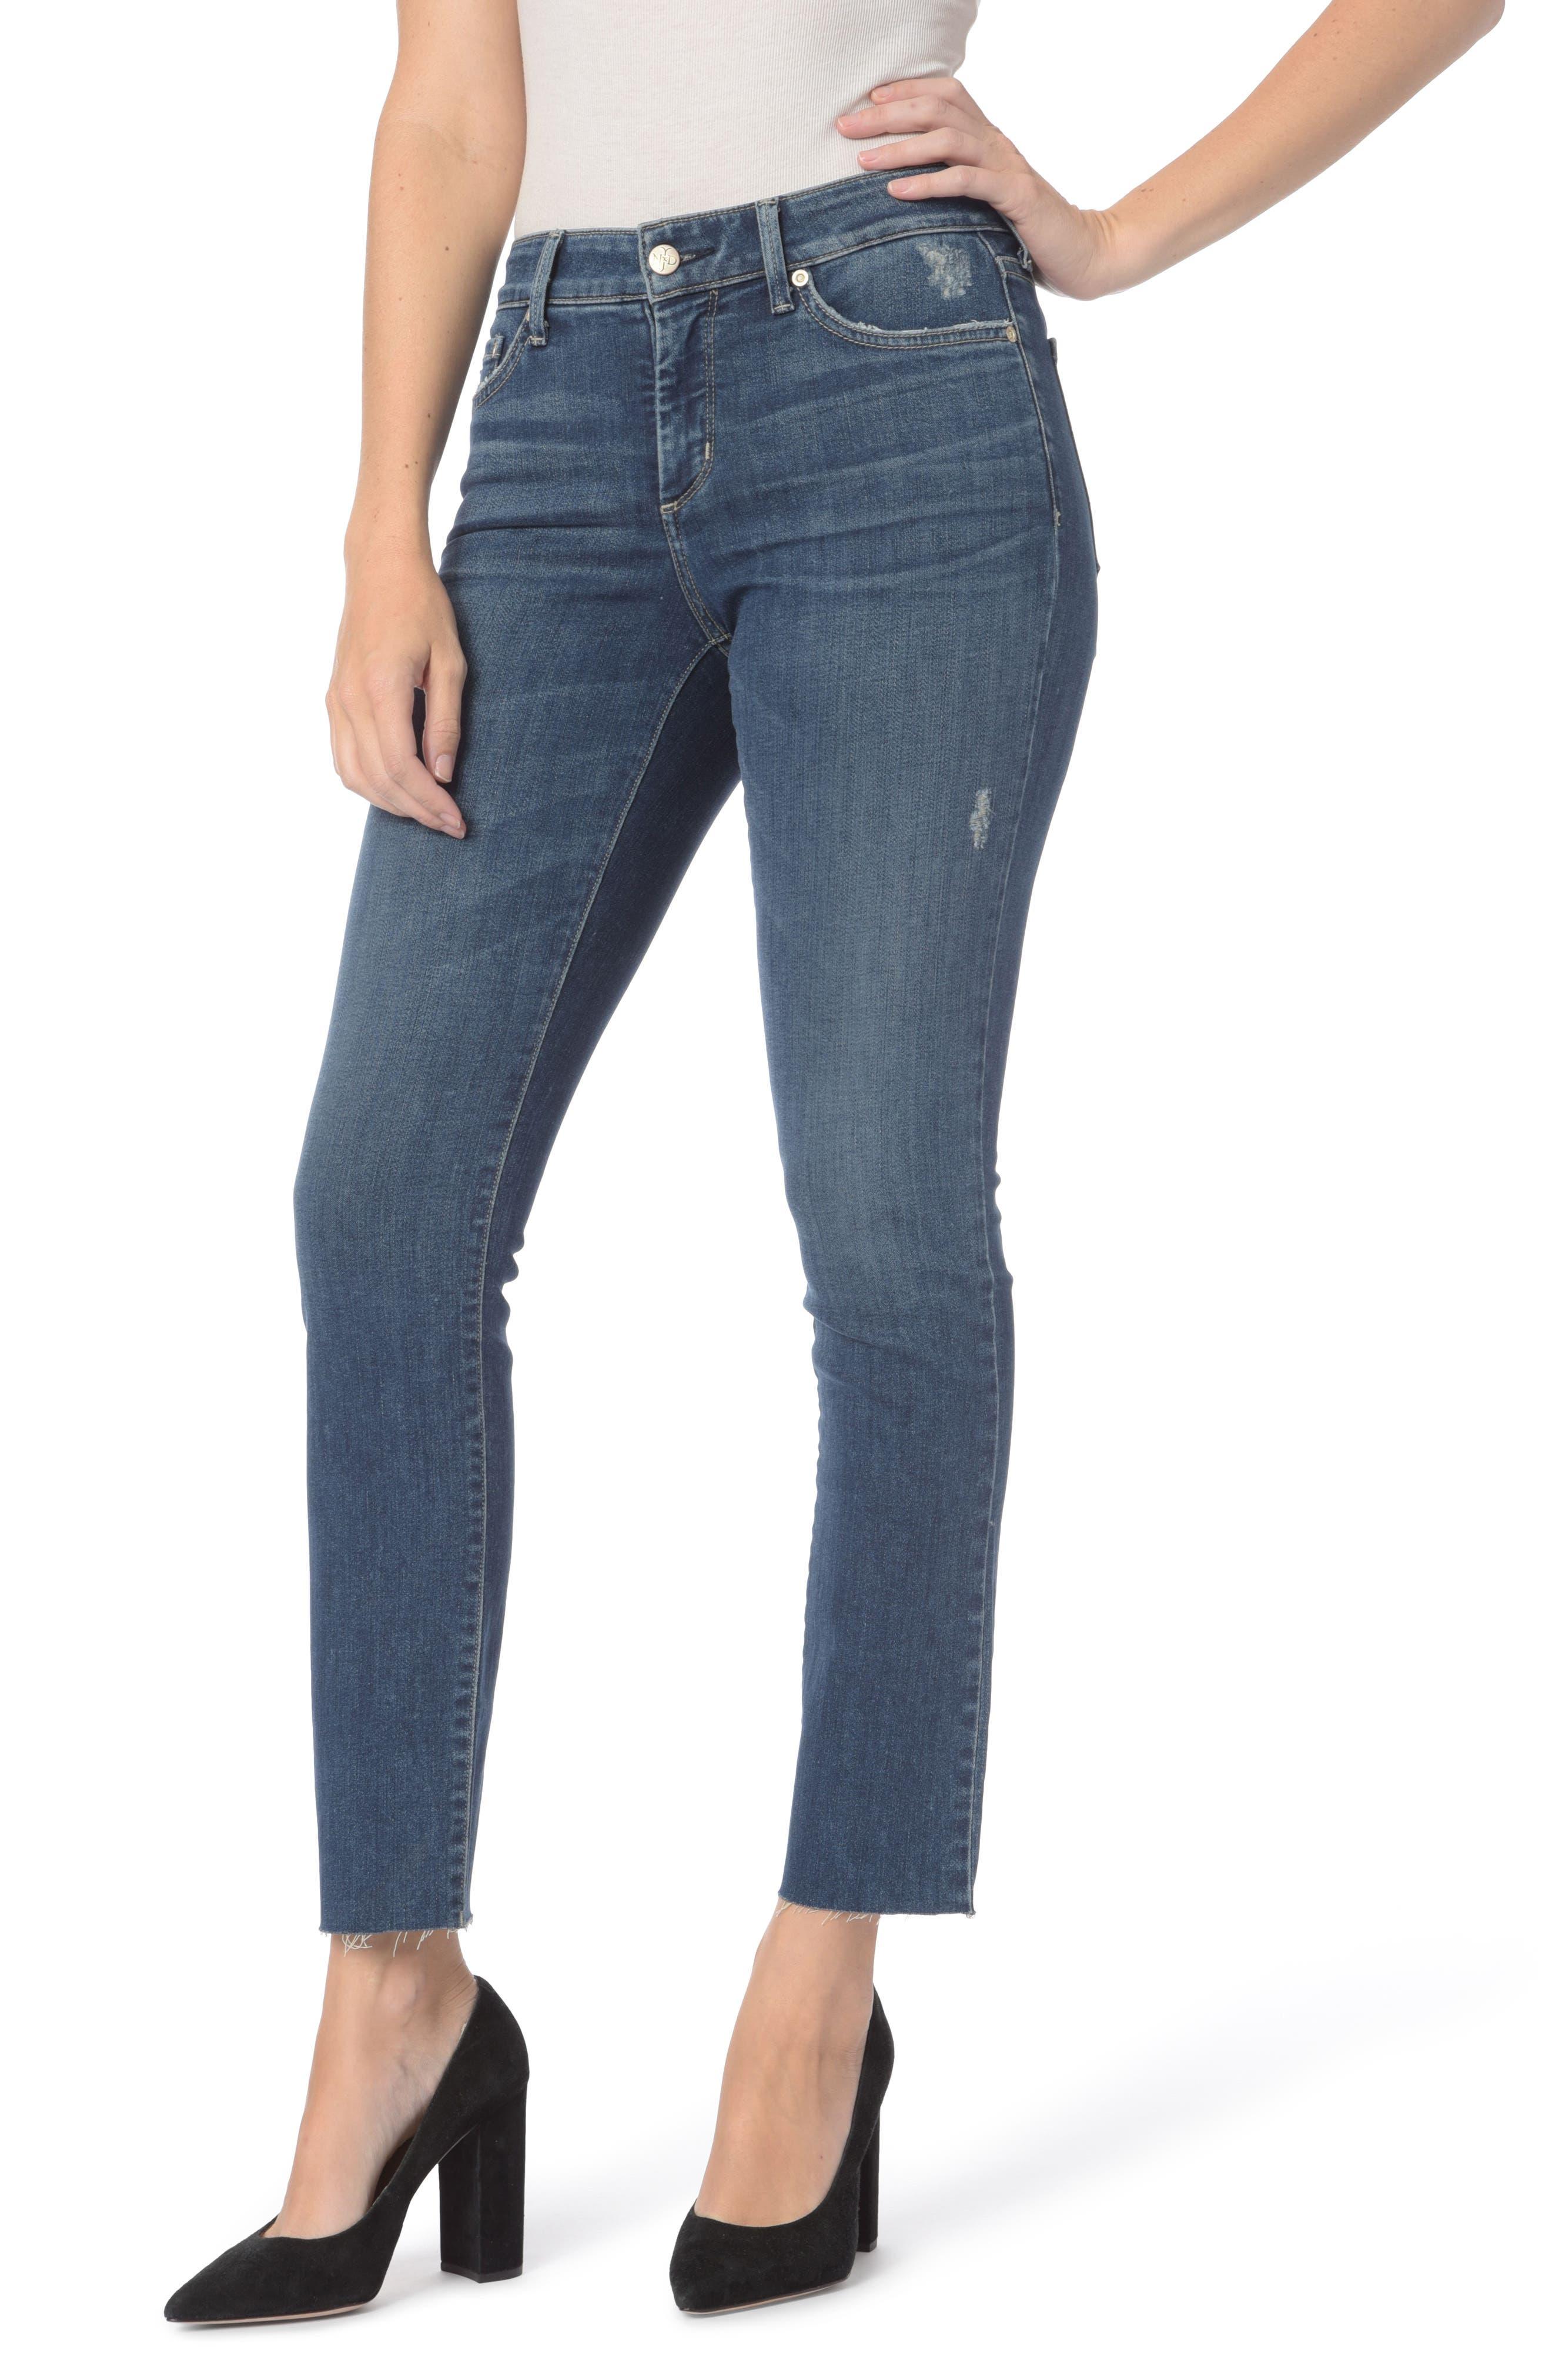 Main Image - NYDJ Sheri Raw Hem Stretch Slim Ankle Jeans (Parke)